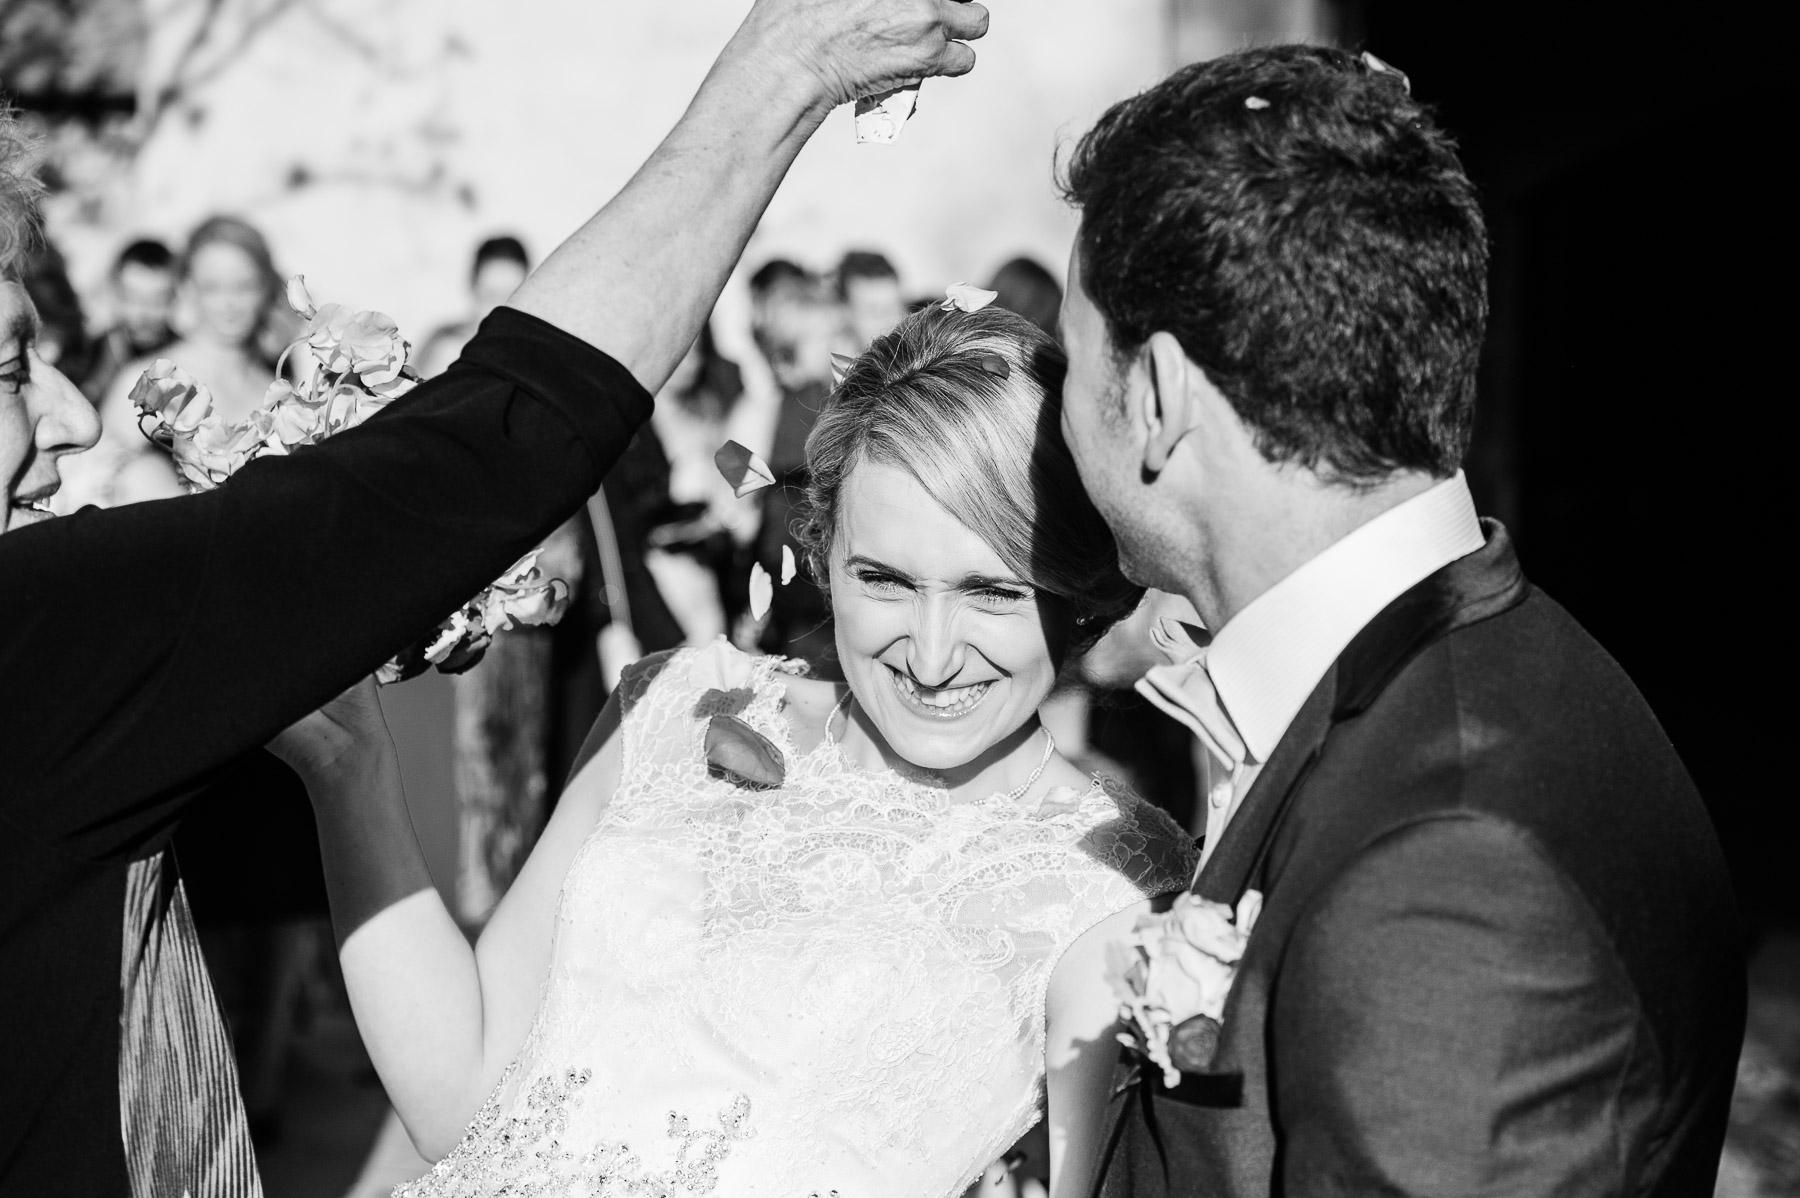 Marnie_and_Charlie_Yarra_Valley_Wedding_Blog-60.jpg